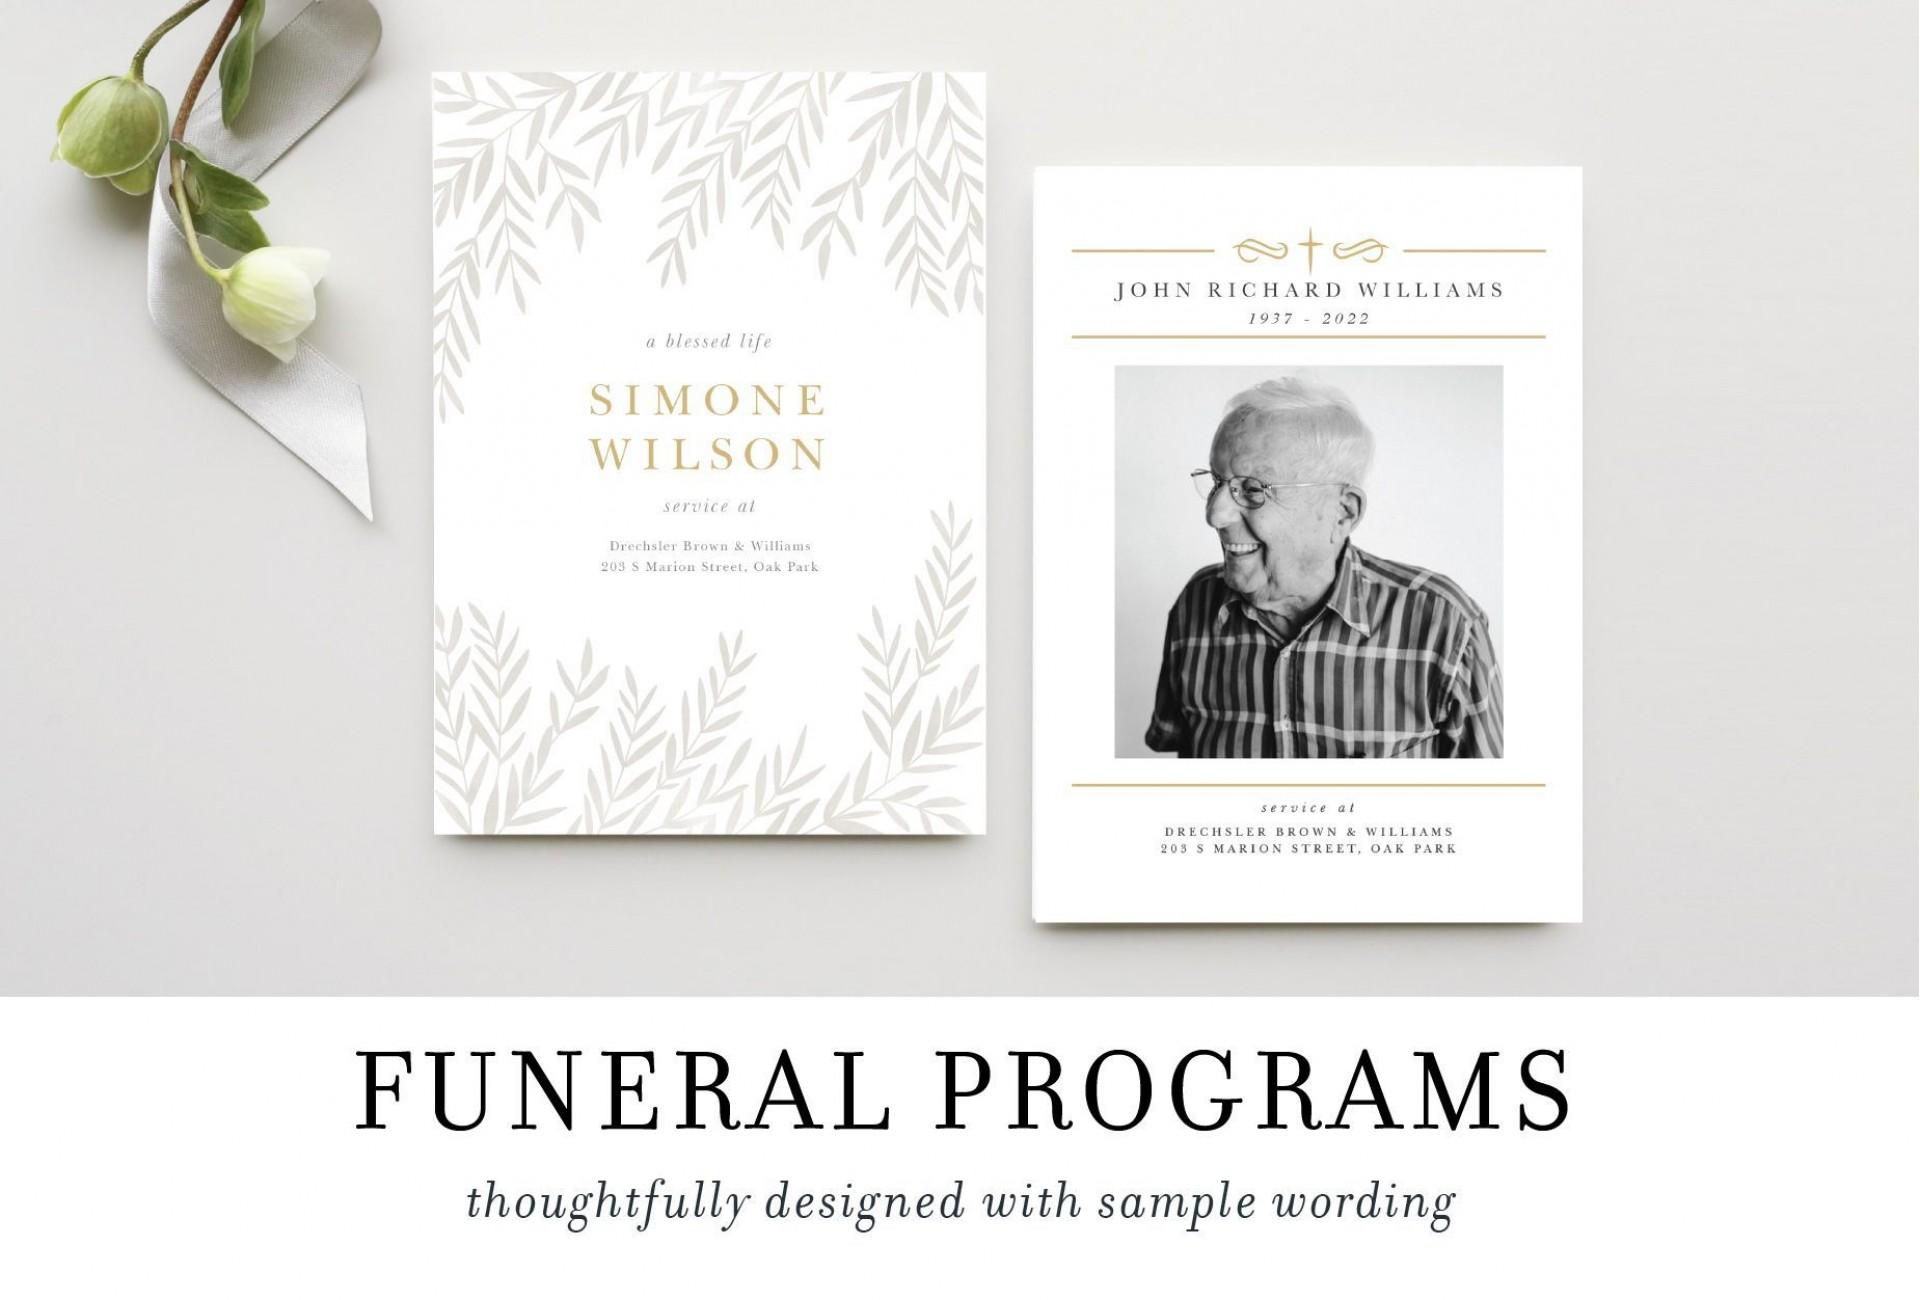 009 Fearsome Sample Wording For Funeral Program Idea  Programs1920